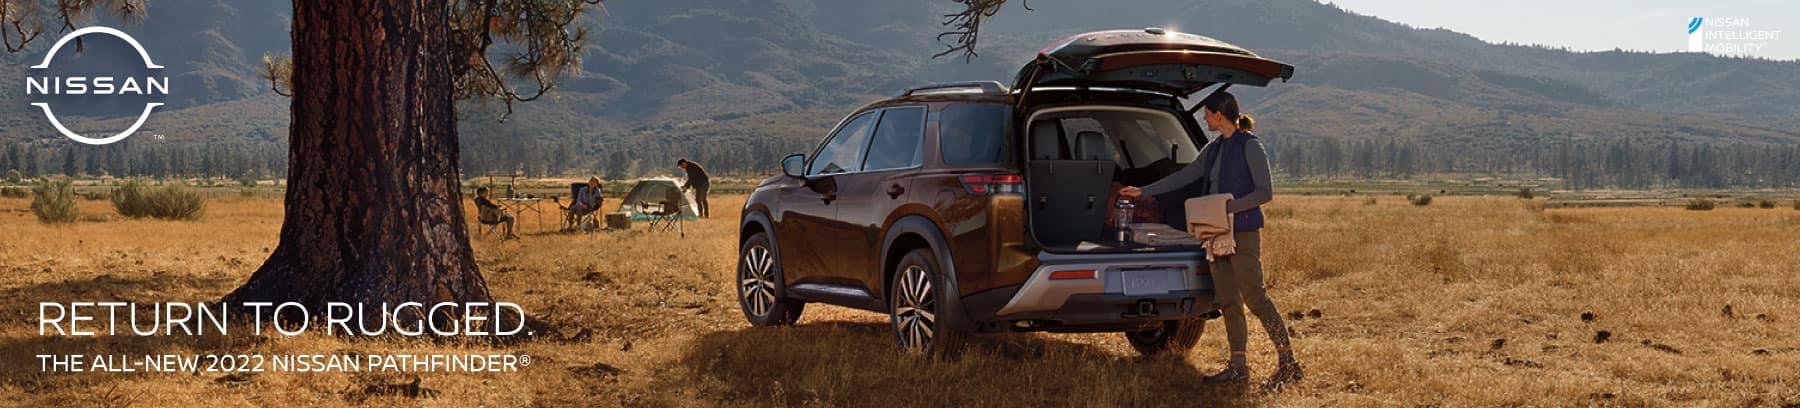 2022 Nissan Pathfinder - Return to rugged